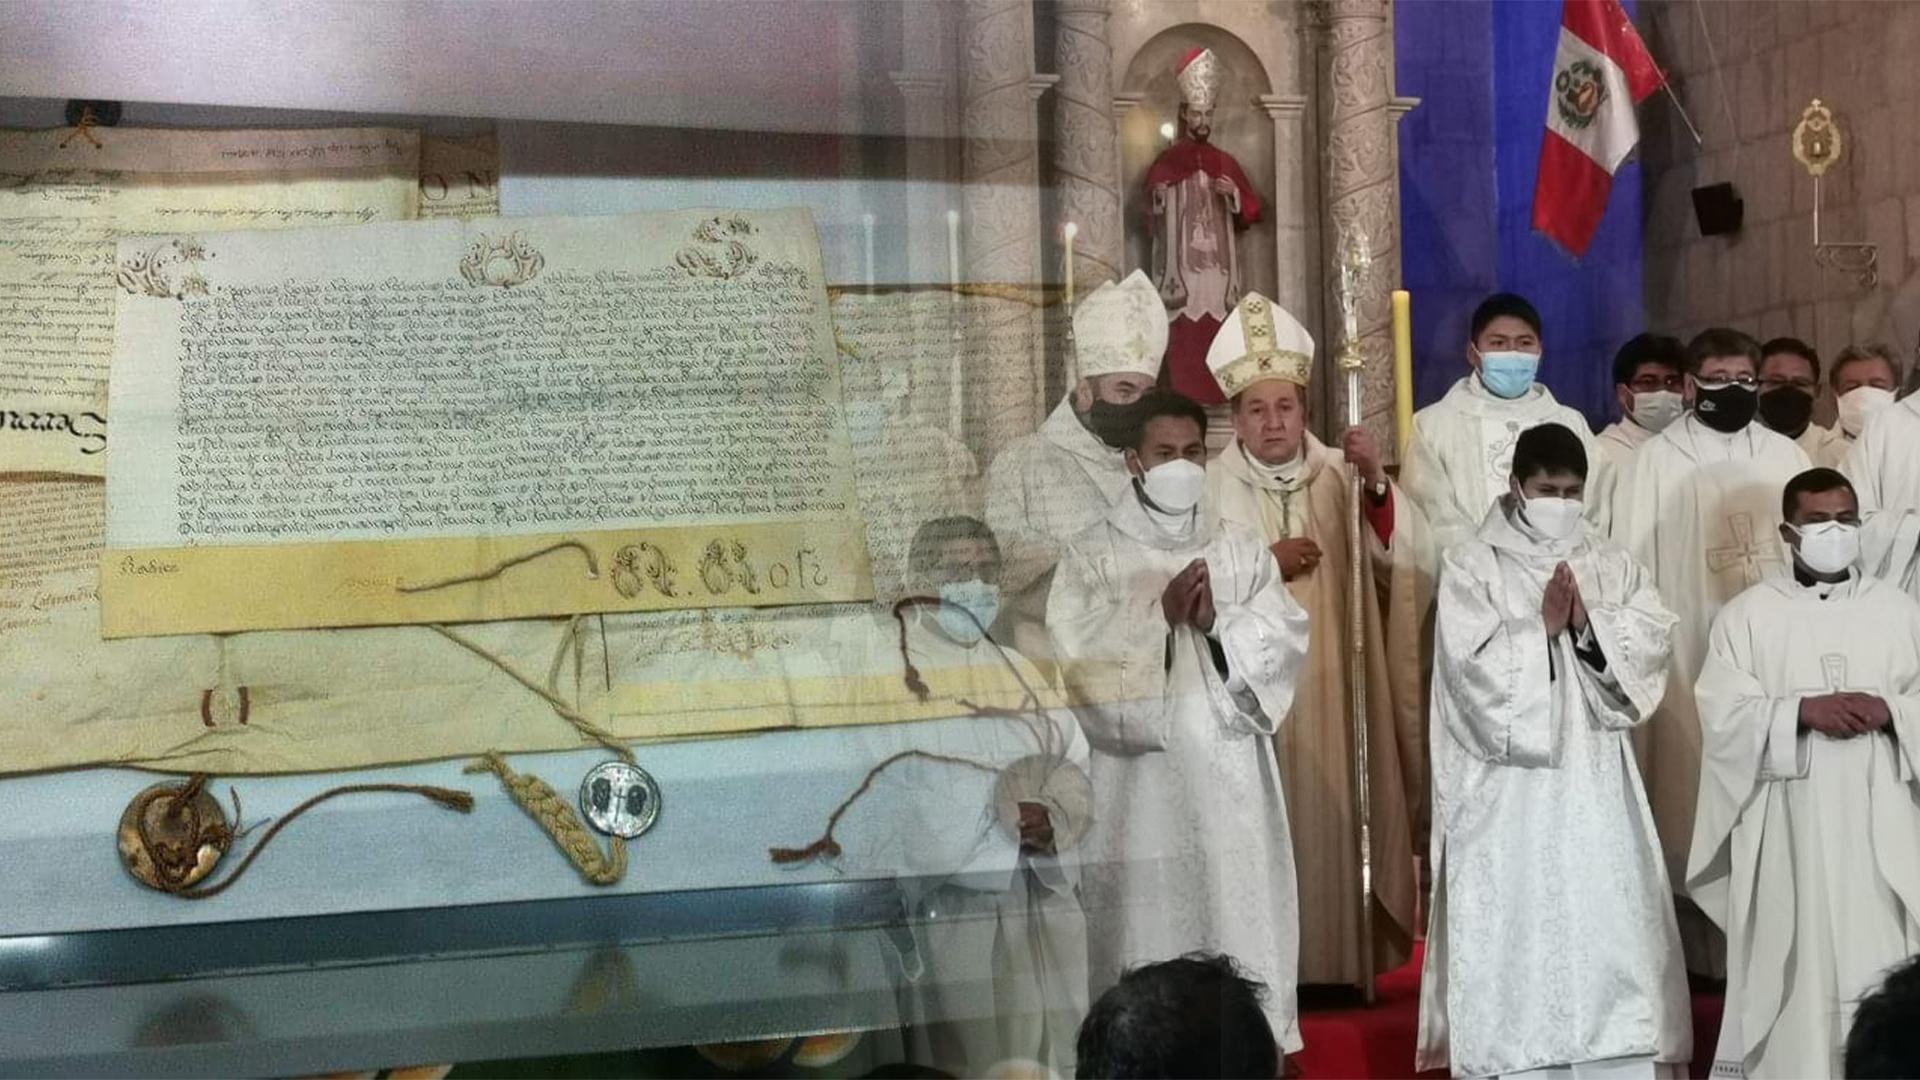 Diócesis San Carlos Borromeo de Puno